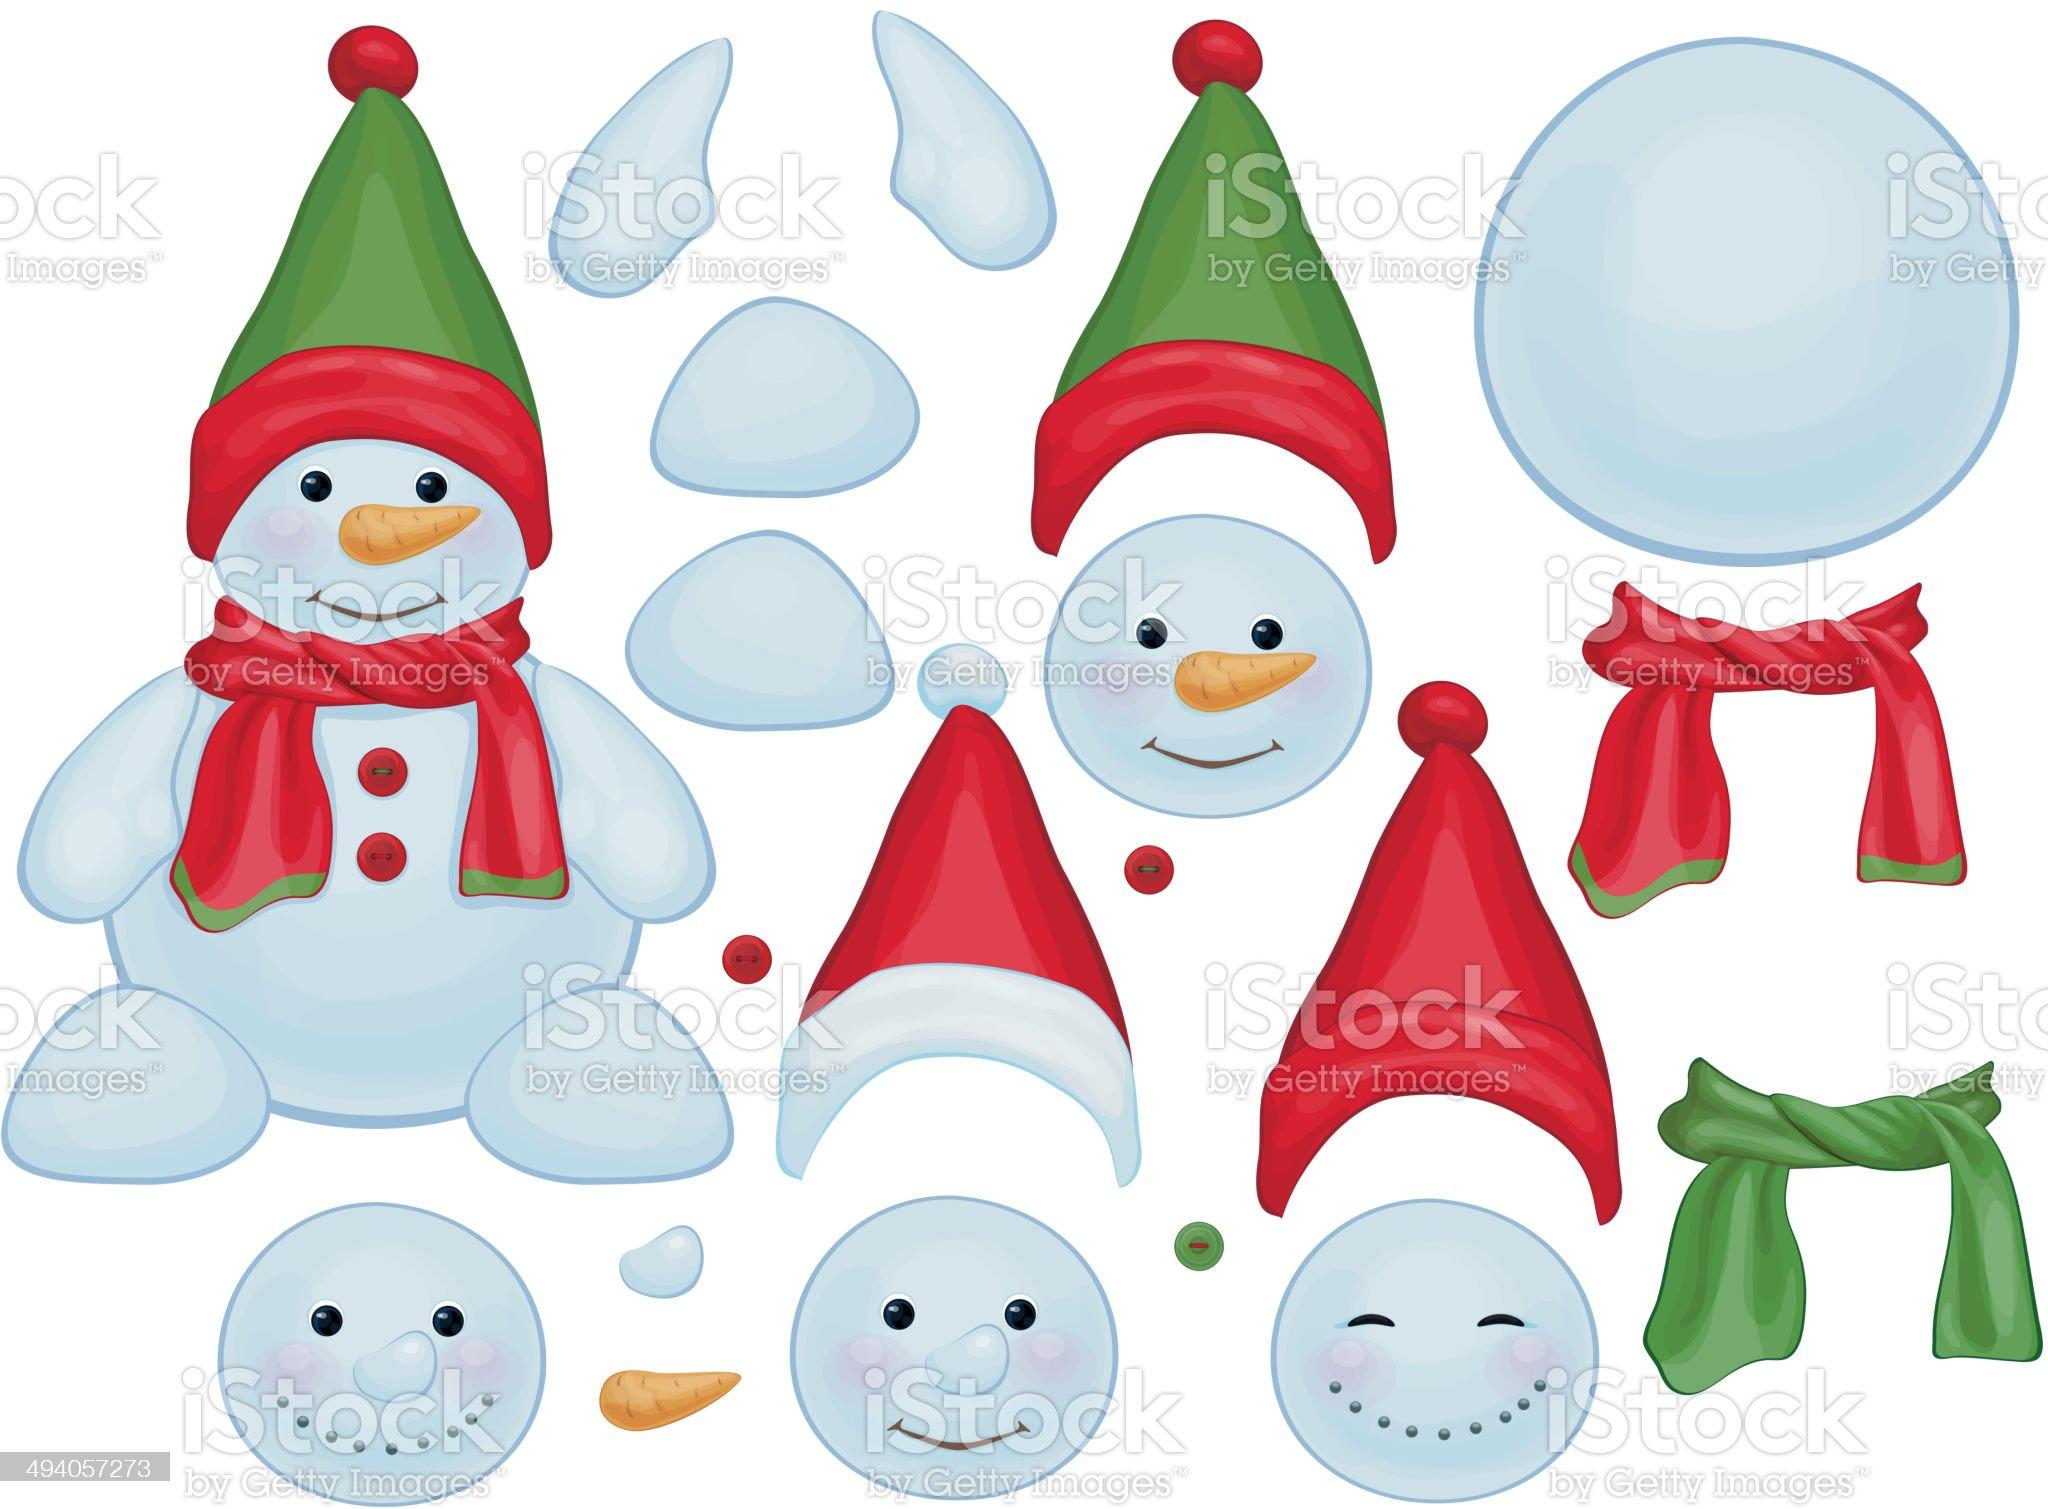 Vector snowman template, make own snowman. royalty-free stock vector art